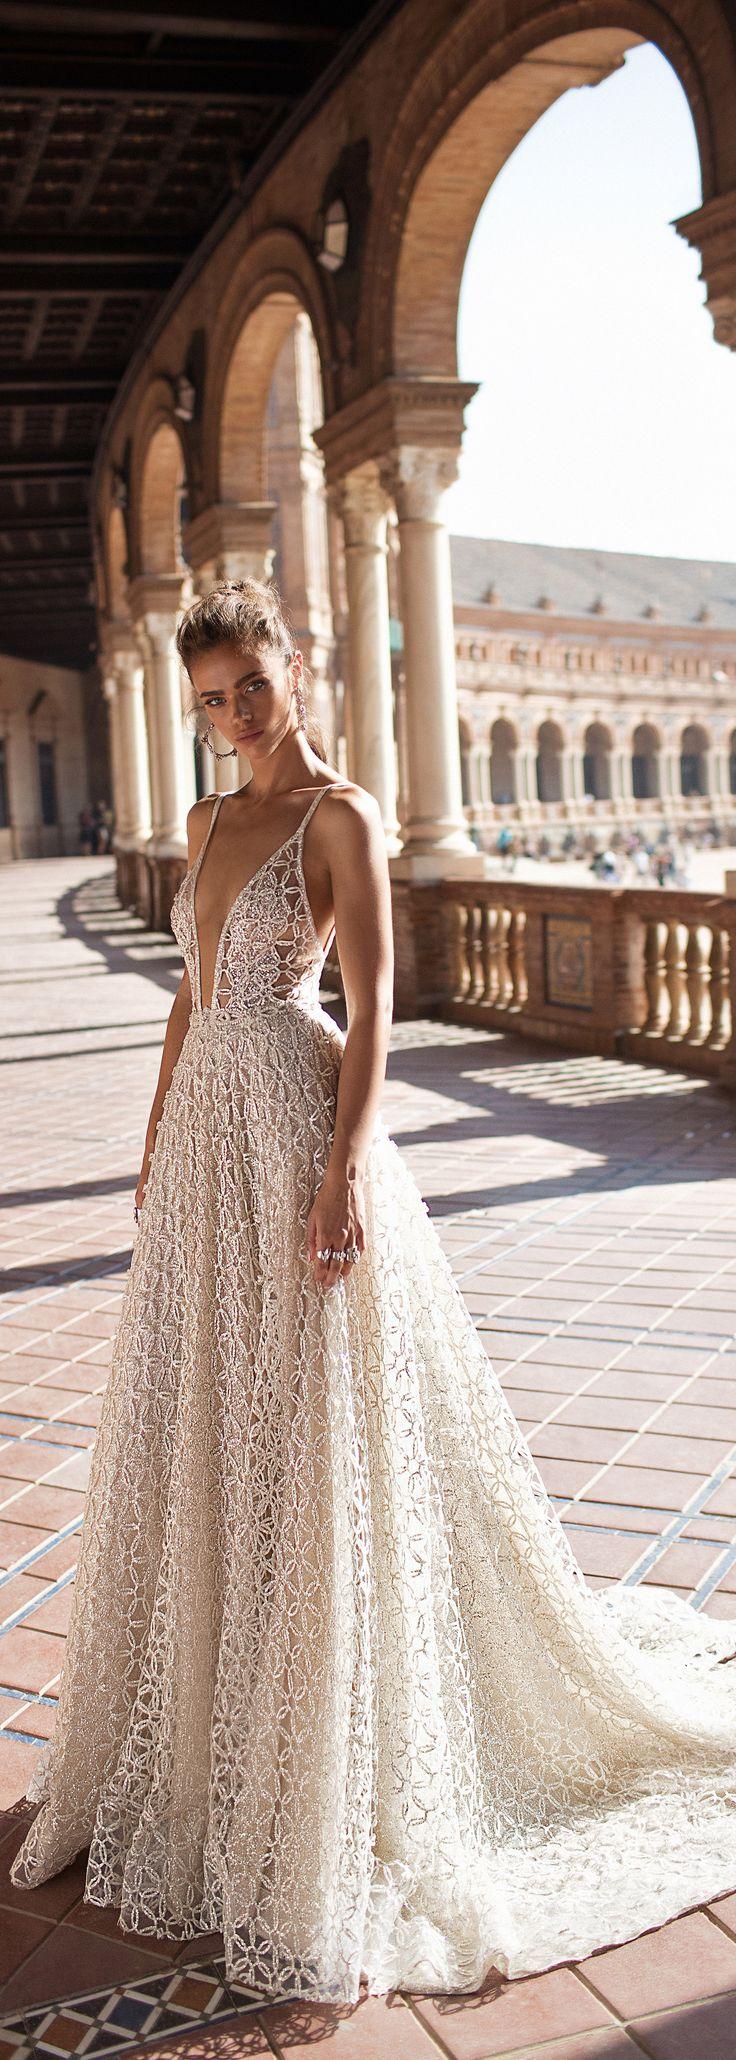 A beautiful v-neck wedding dress by @bertabridal from their BERTA Seville collection #bertabridal #berta